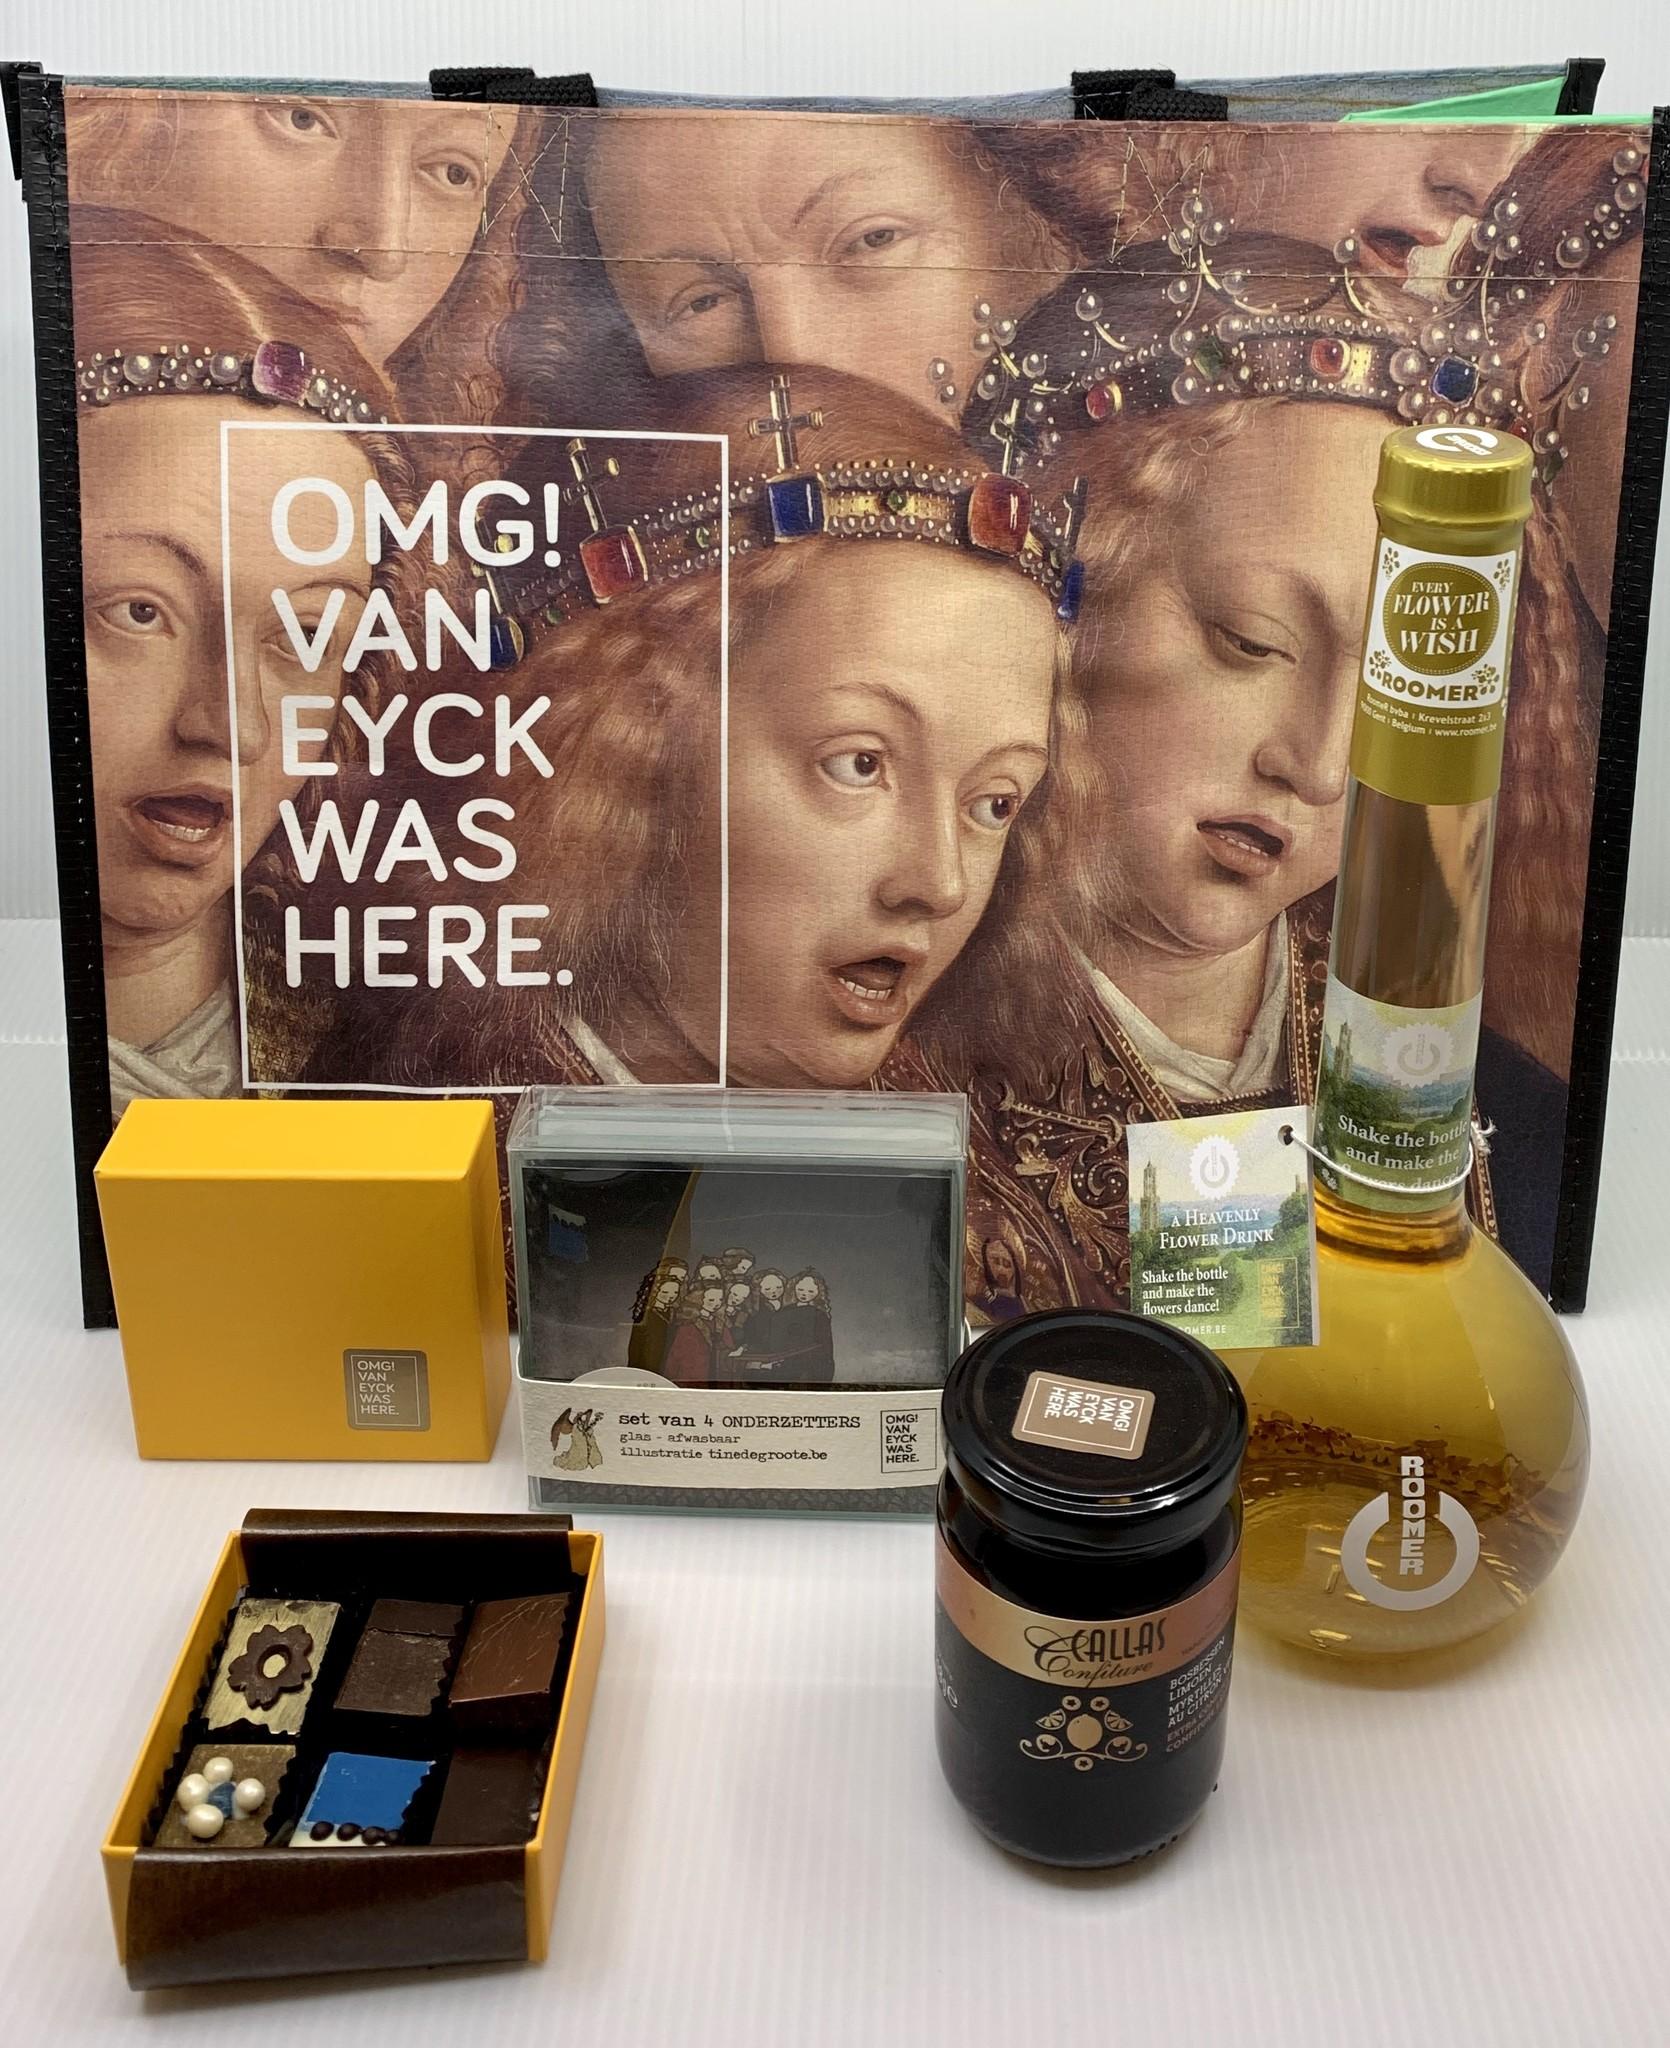 Van Eyck shop Gift box 'Santé & Smakeleyck'